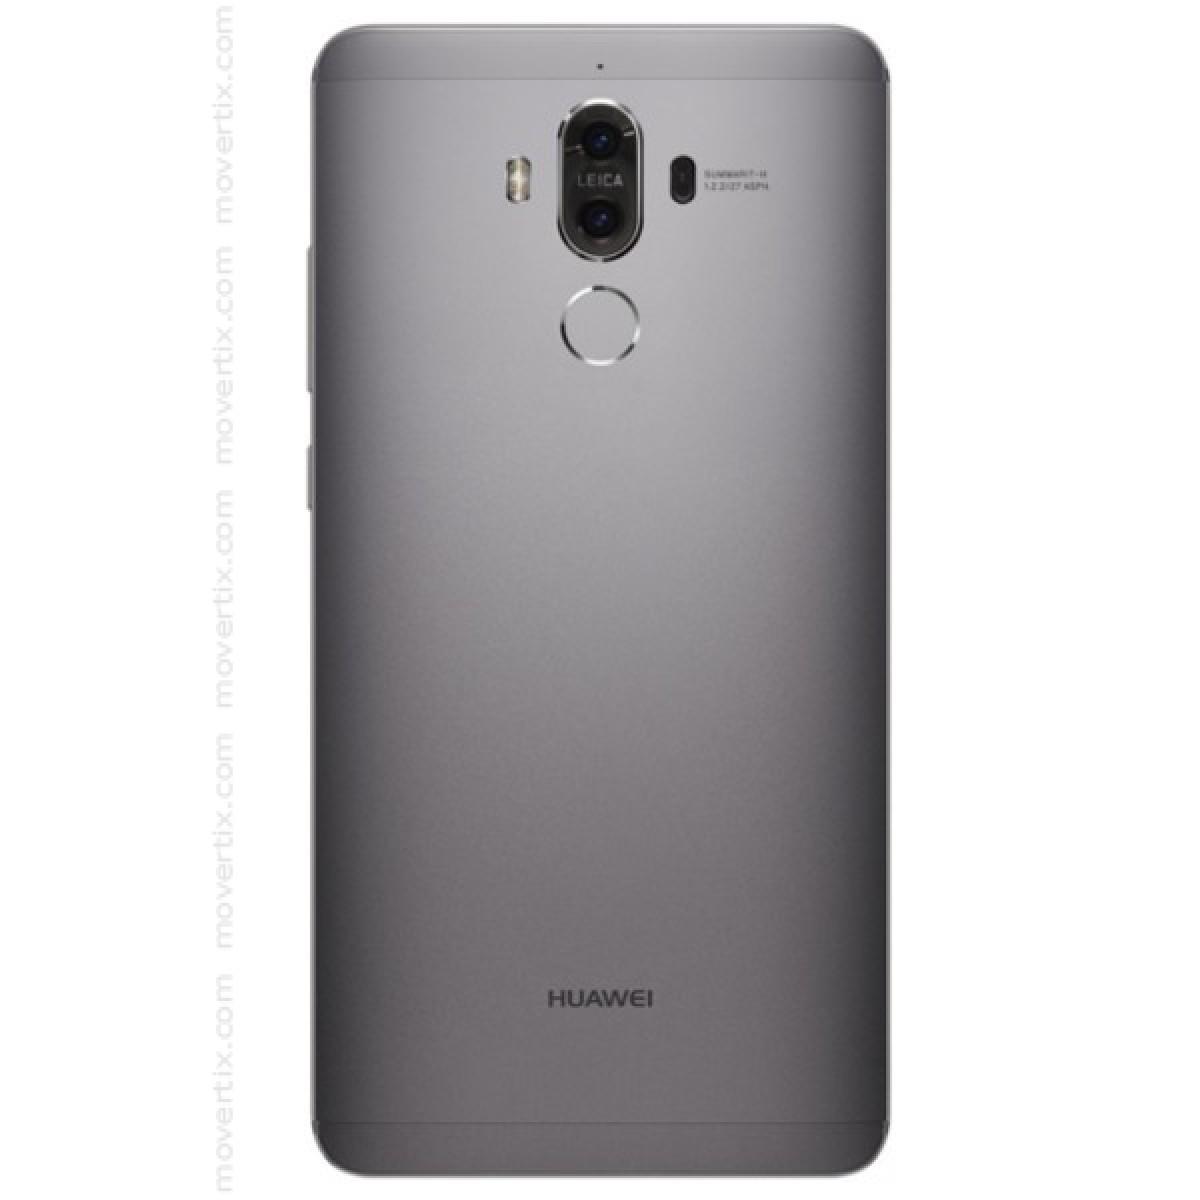 huawei mate 9 gris 6901443153282 movertix t l phones mobiles et smartphones. Black Bedroom Furniture Sets. Home Design Ideas